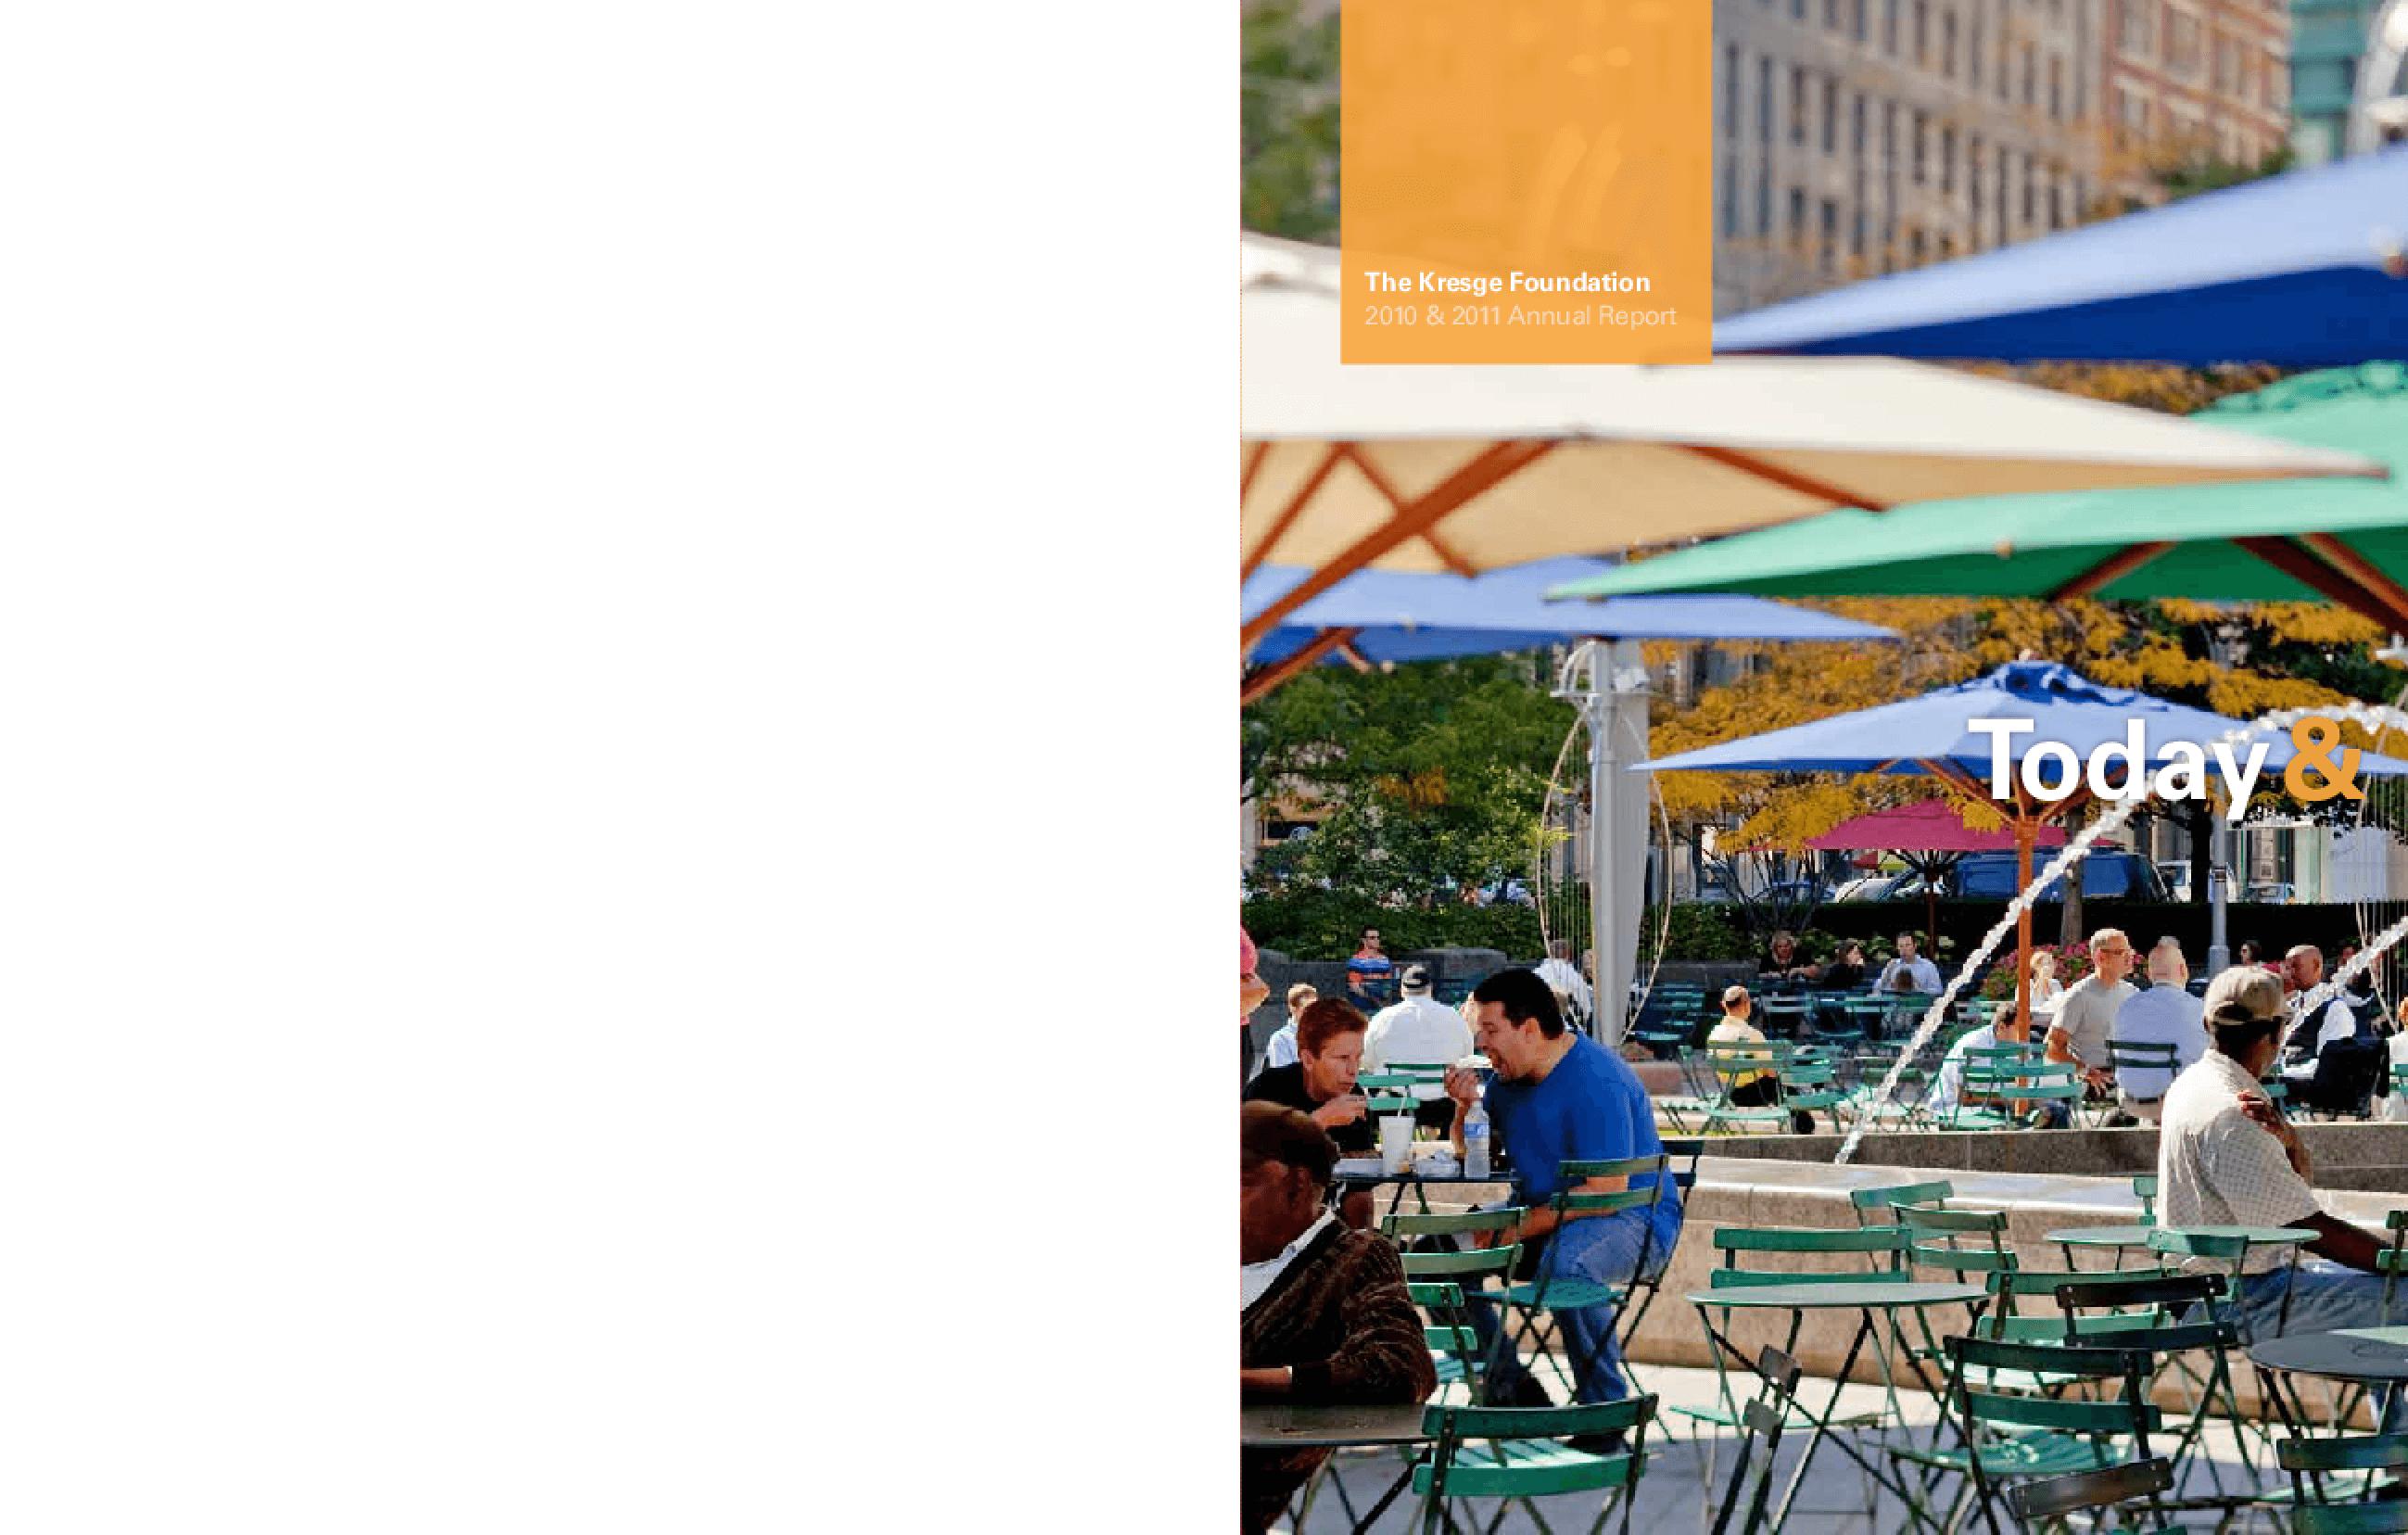 Kresge Foundation 2010-2011 Annual Report